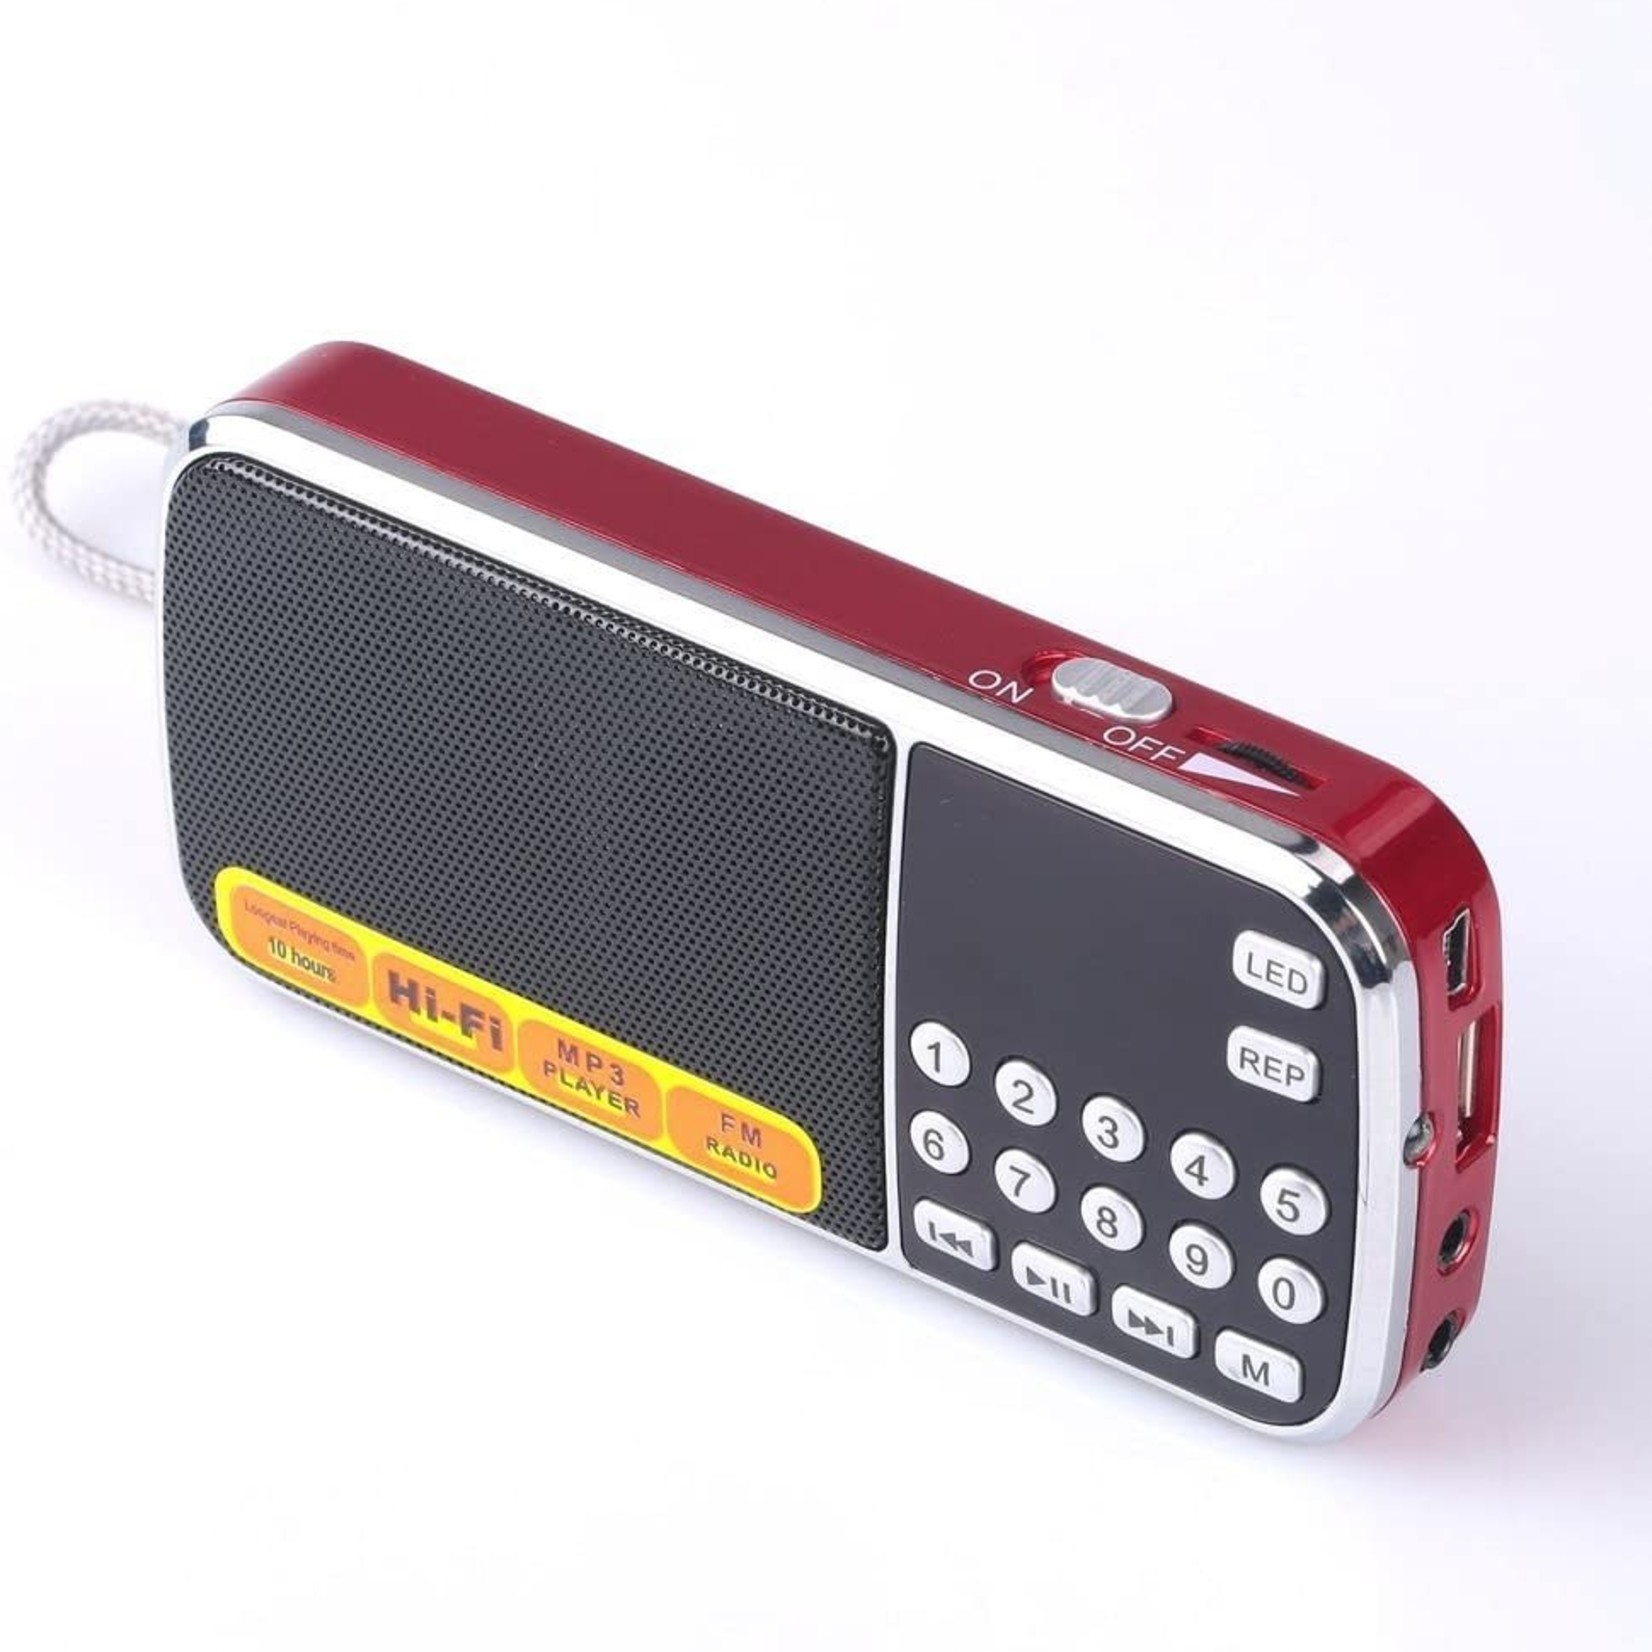 Mfine Portable Mini USB FM Radio Speaker Music Player Micro SD/TF Card For PC iPod Phone